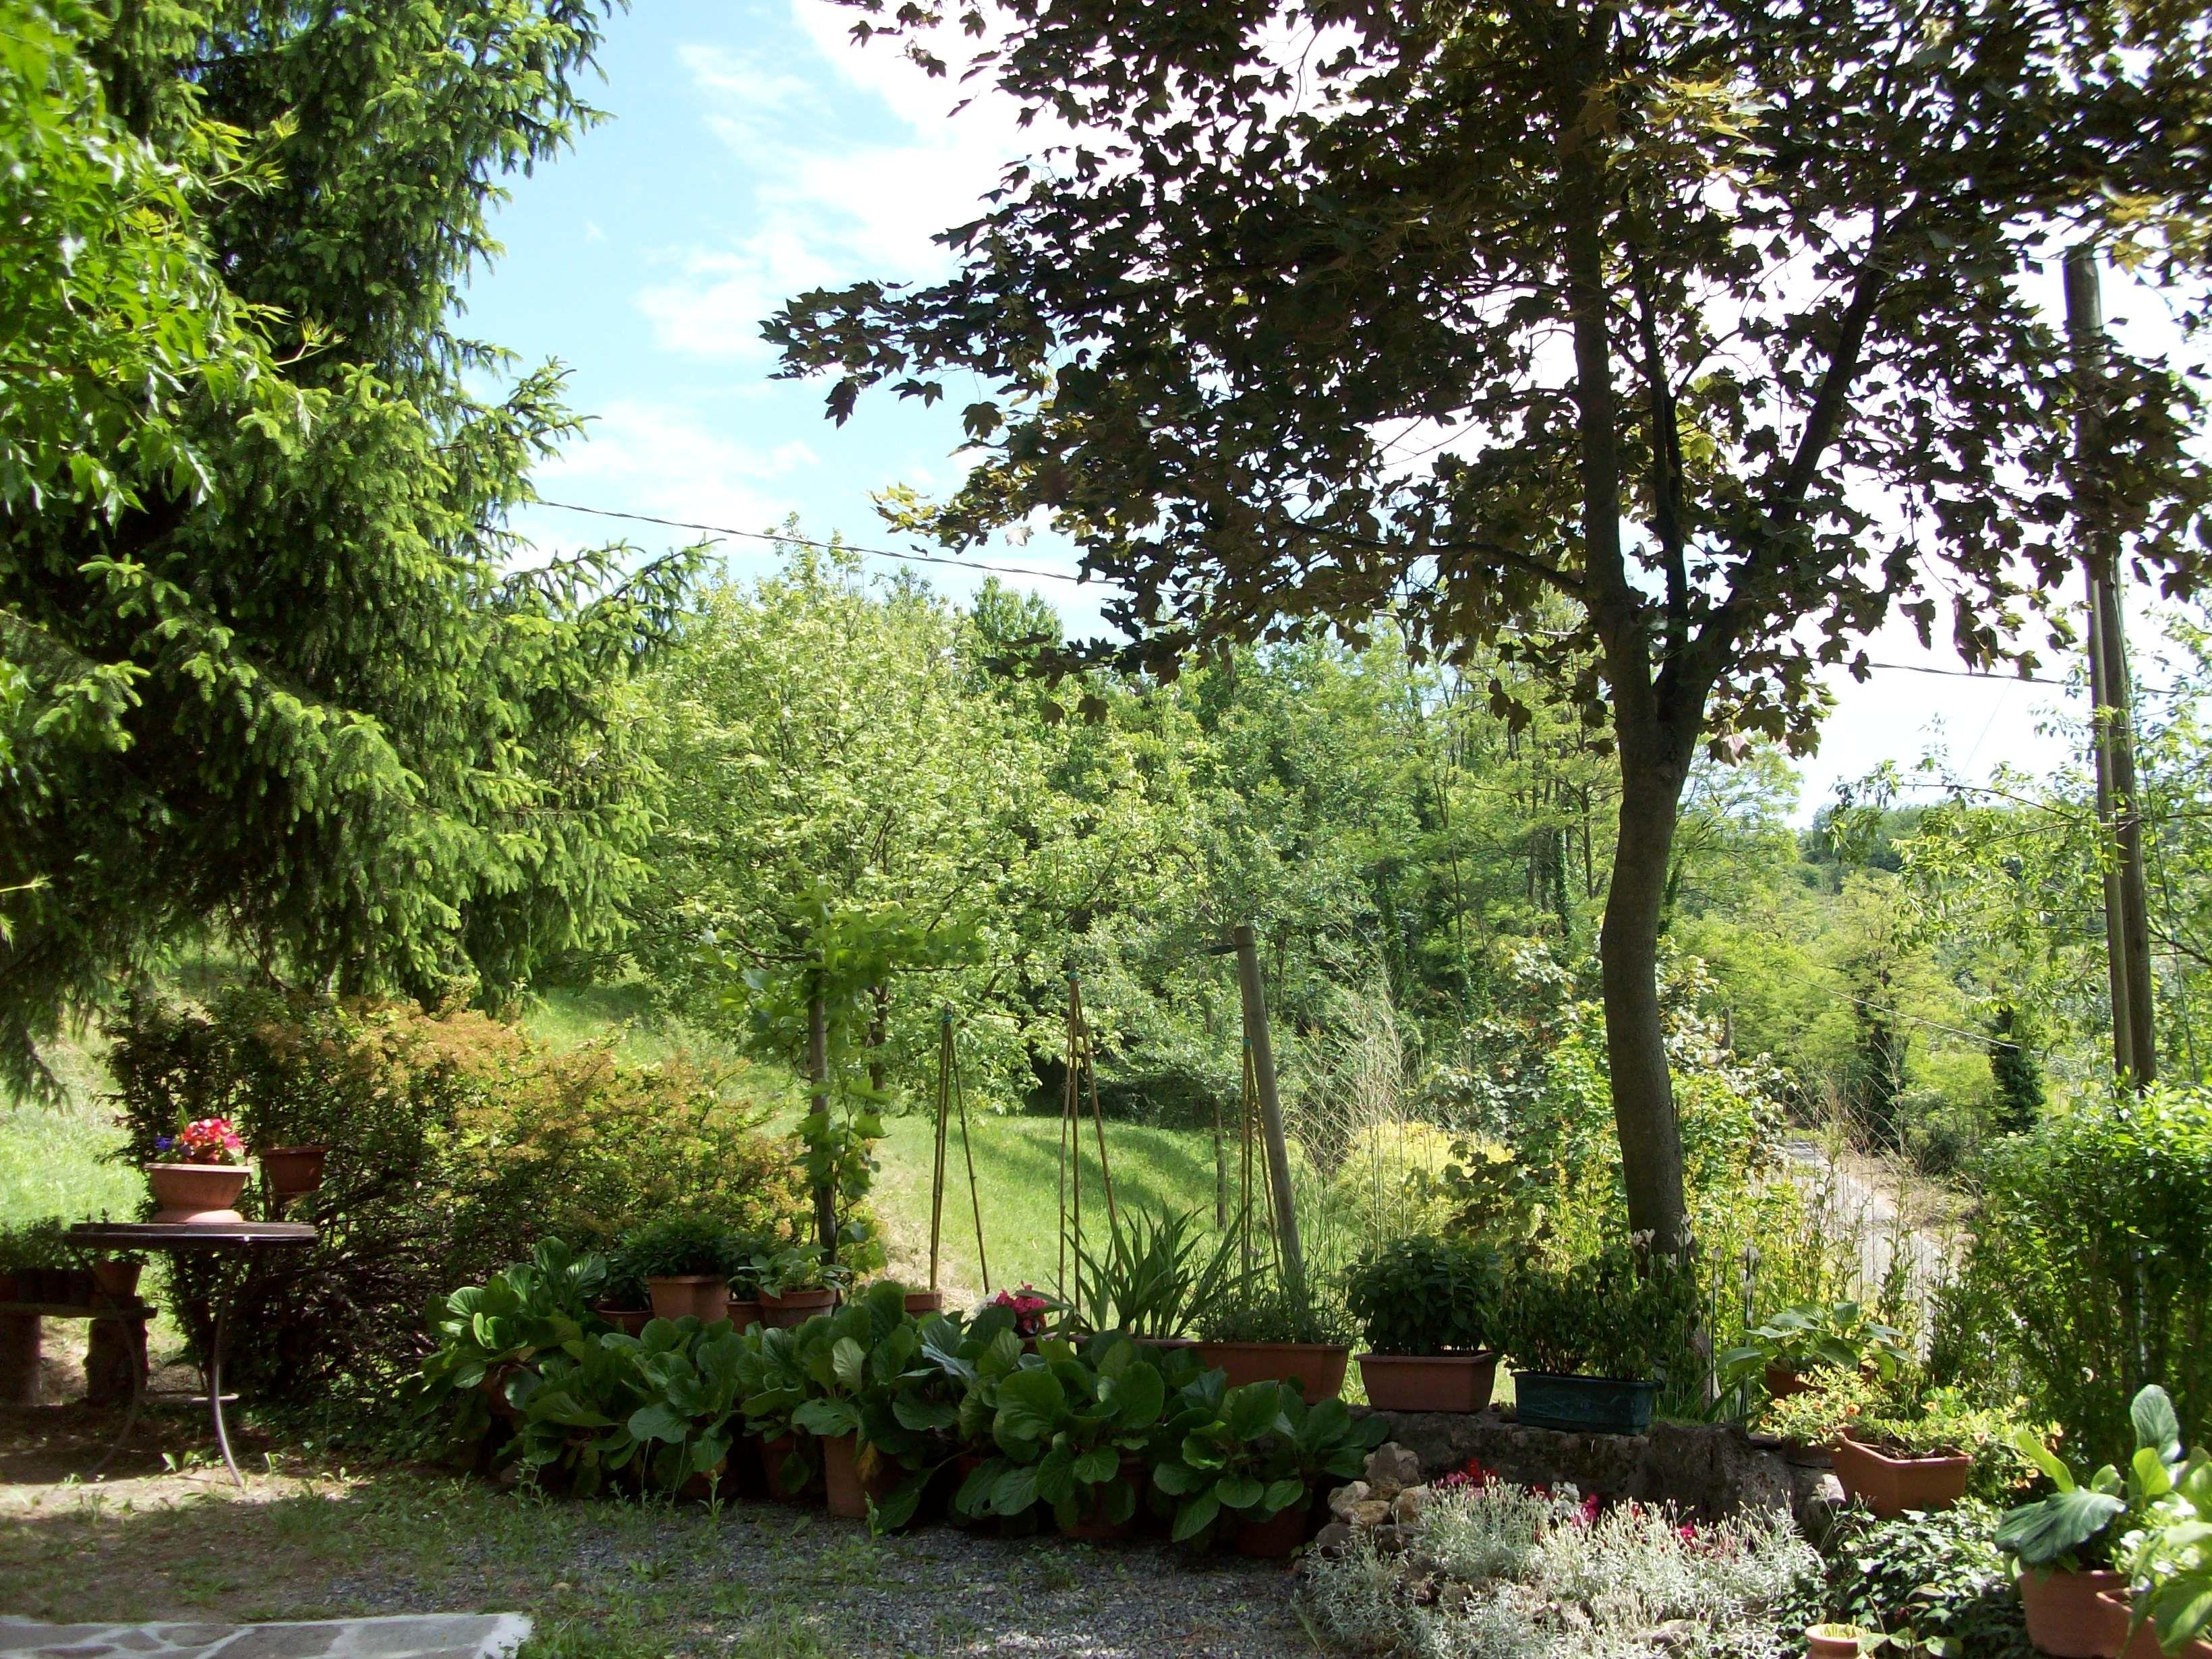 Giardino rustico paesaggi e fiori pinterest - Giardino rustico ...